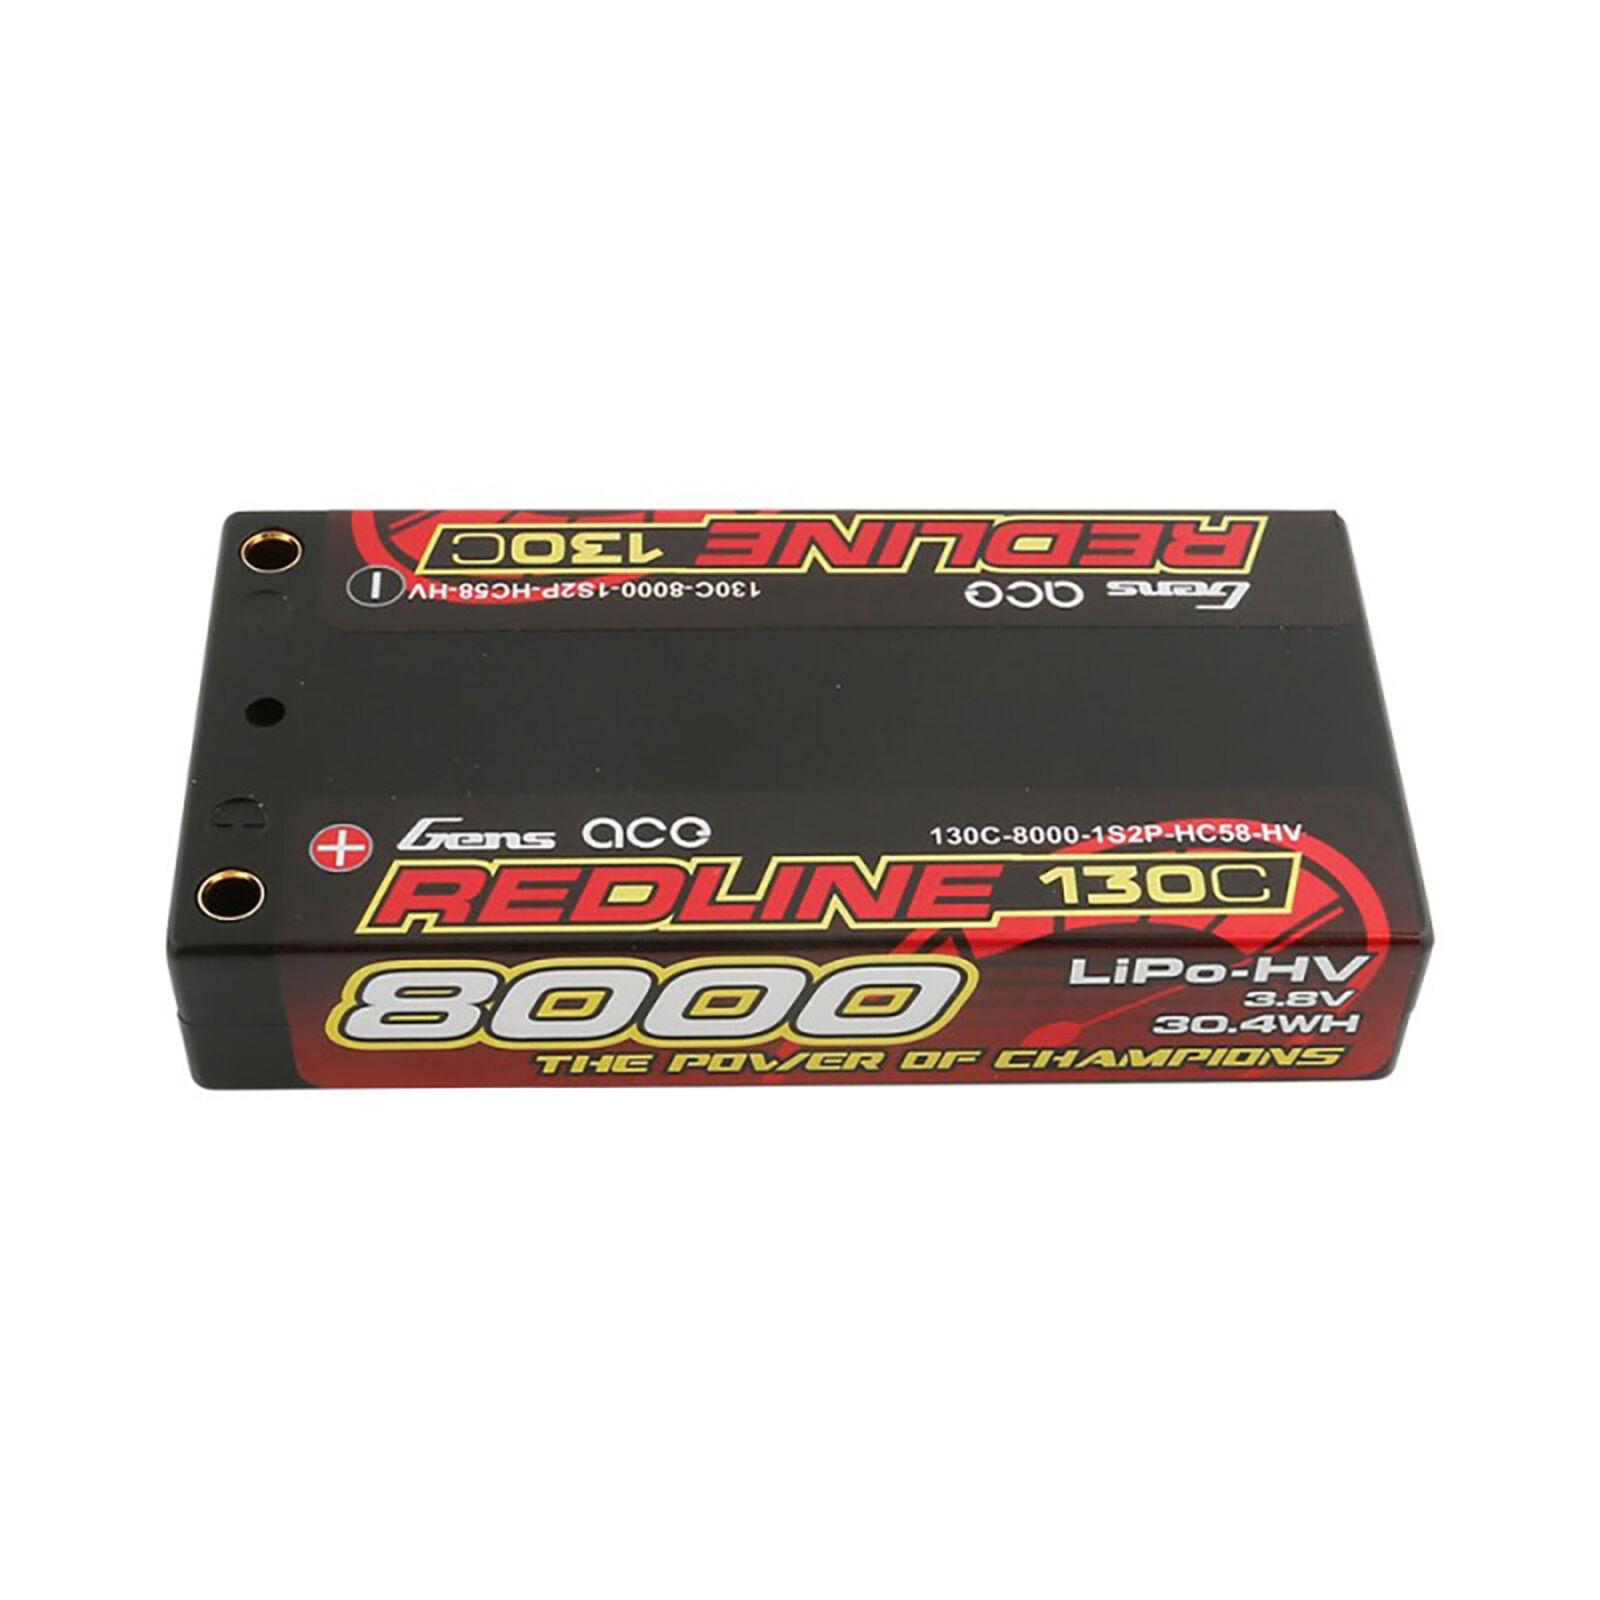 3.8V 8000mAh 1S 130C HV LiPo: 4.0mm Bullet